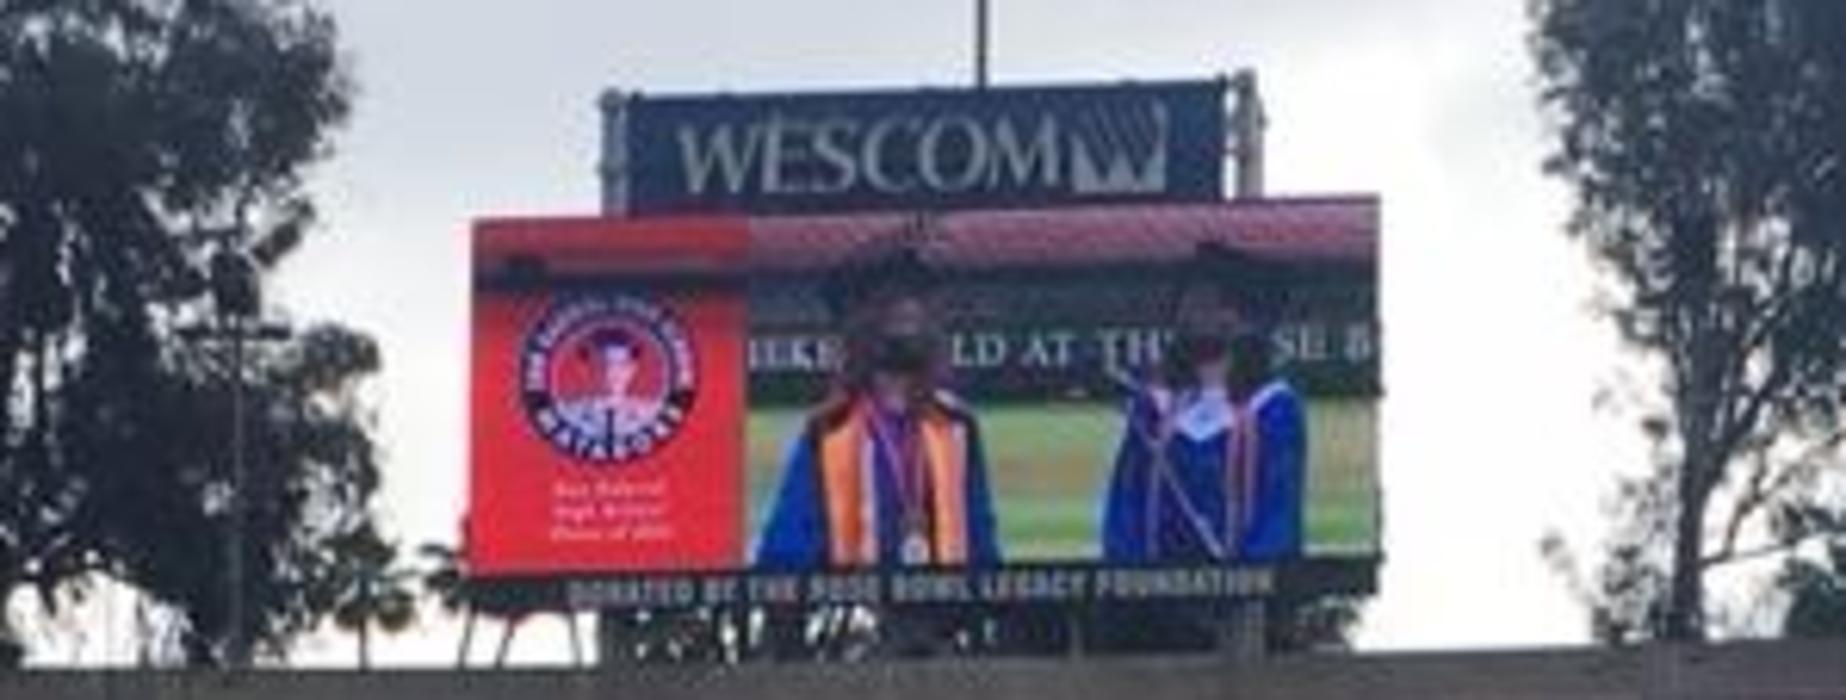 SGHS 2021 Graduates on screen